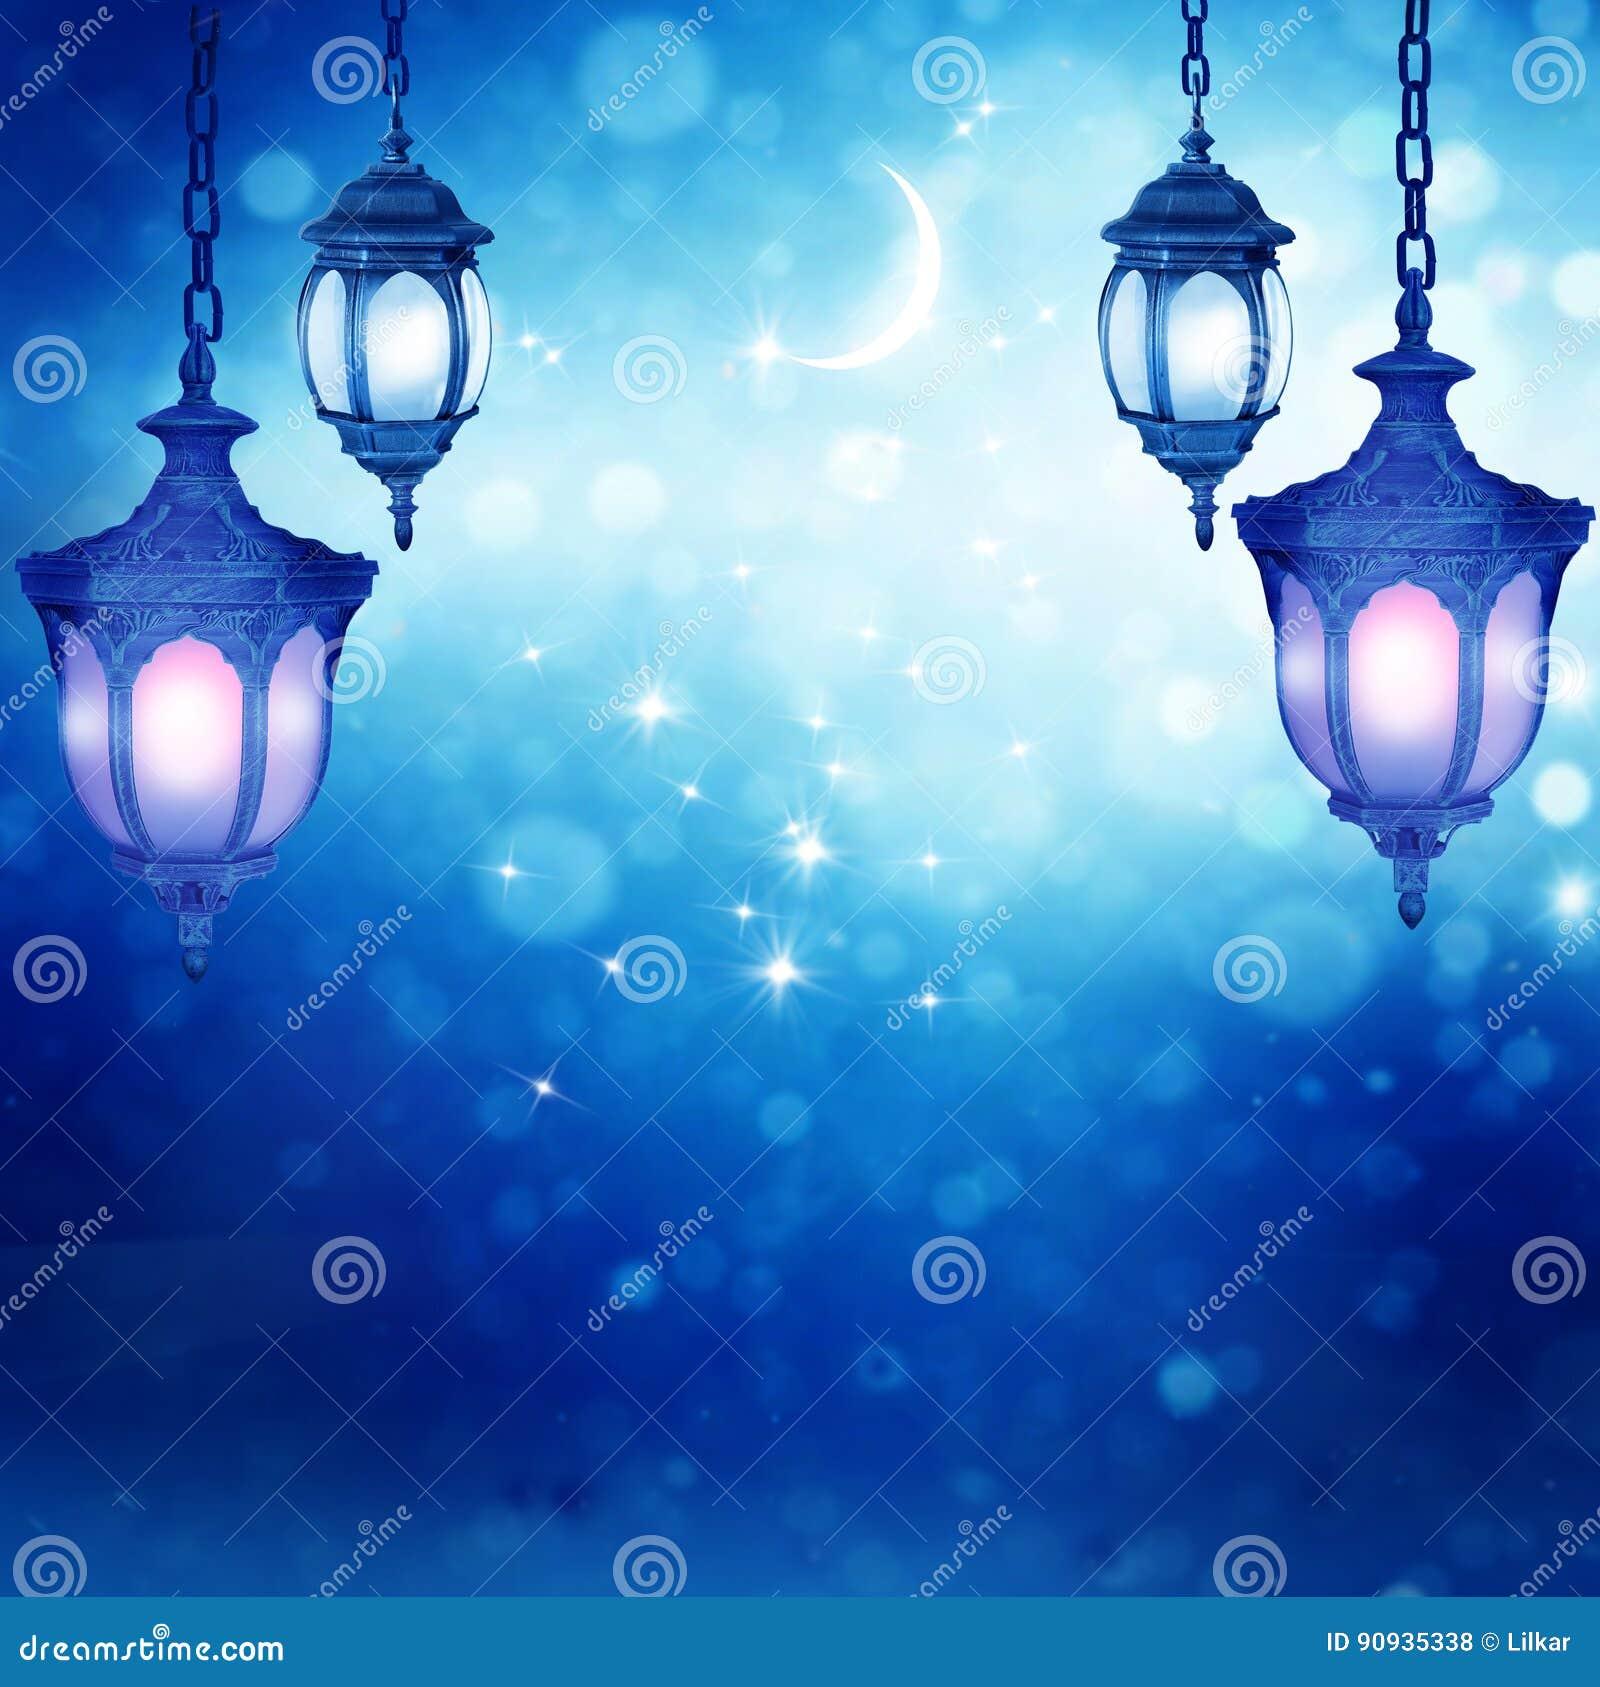 11 292 eid mubarak background photos free royalty free stock photos from dreamstime dreamstime com